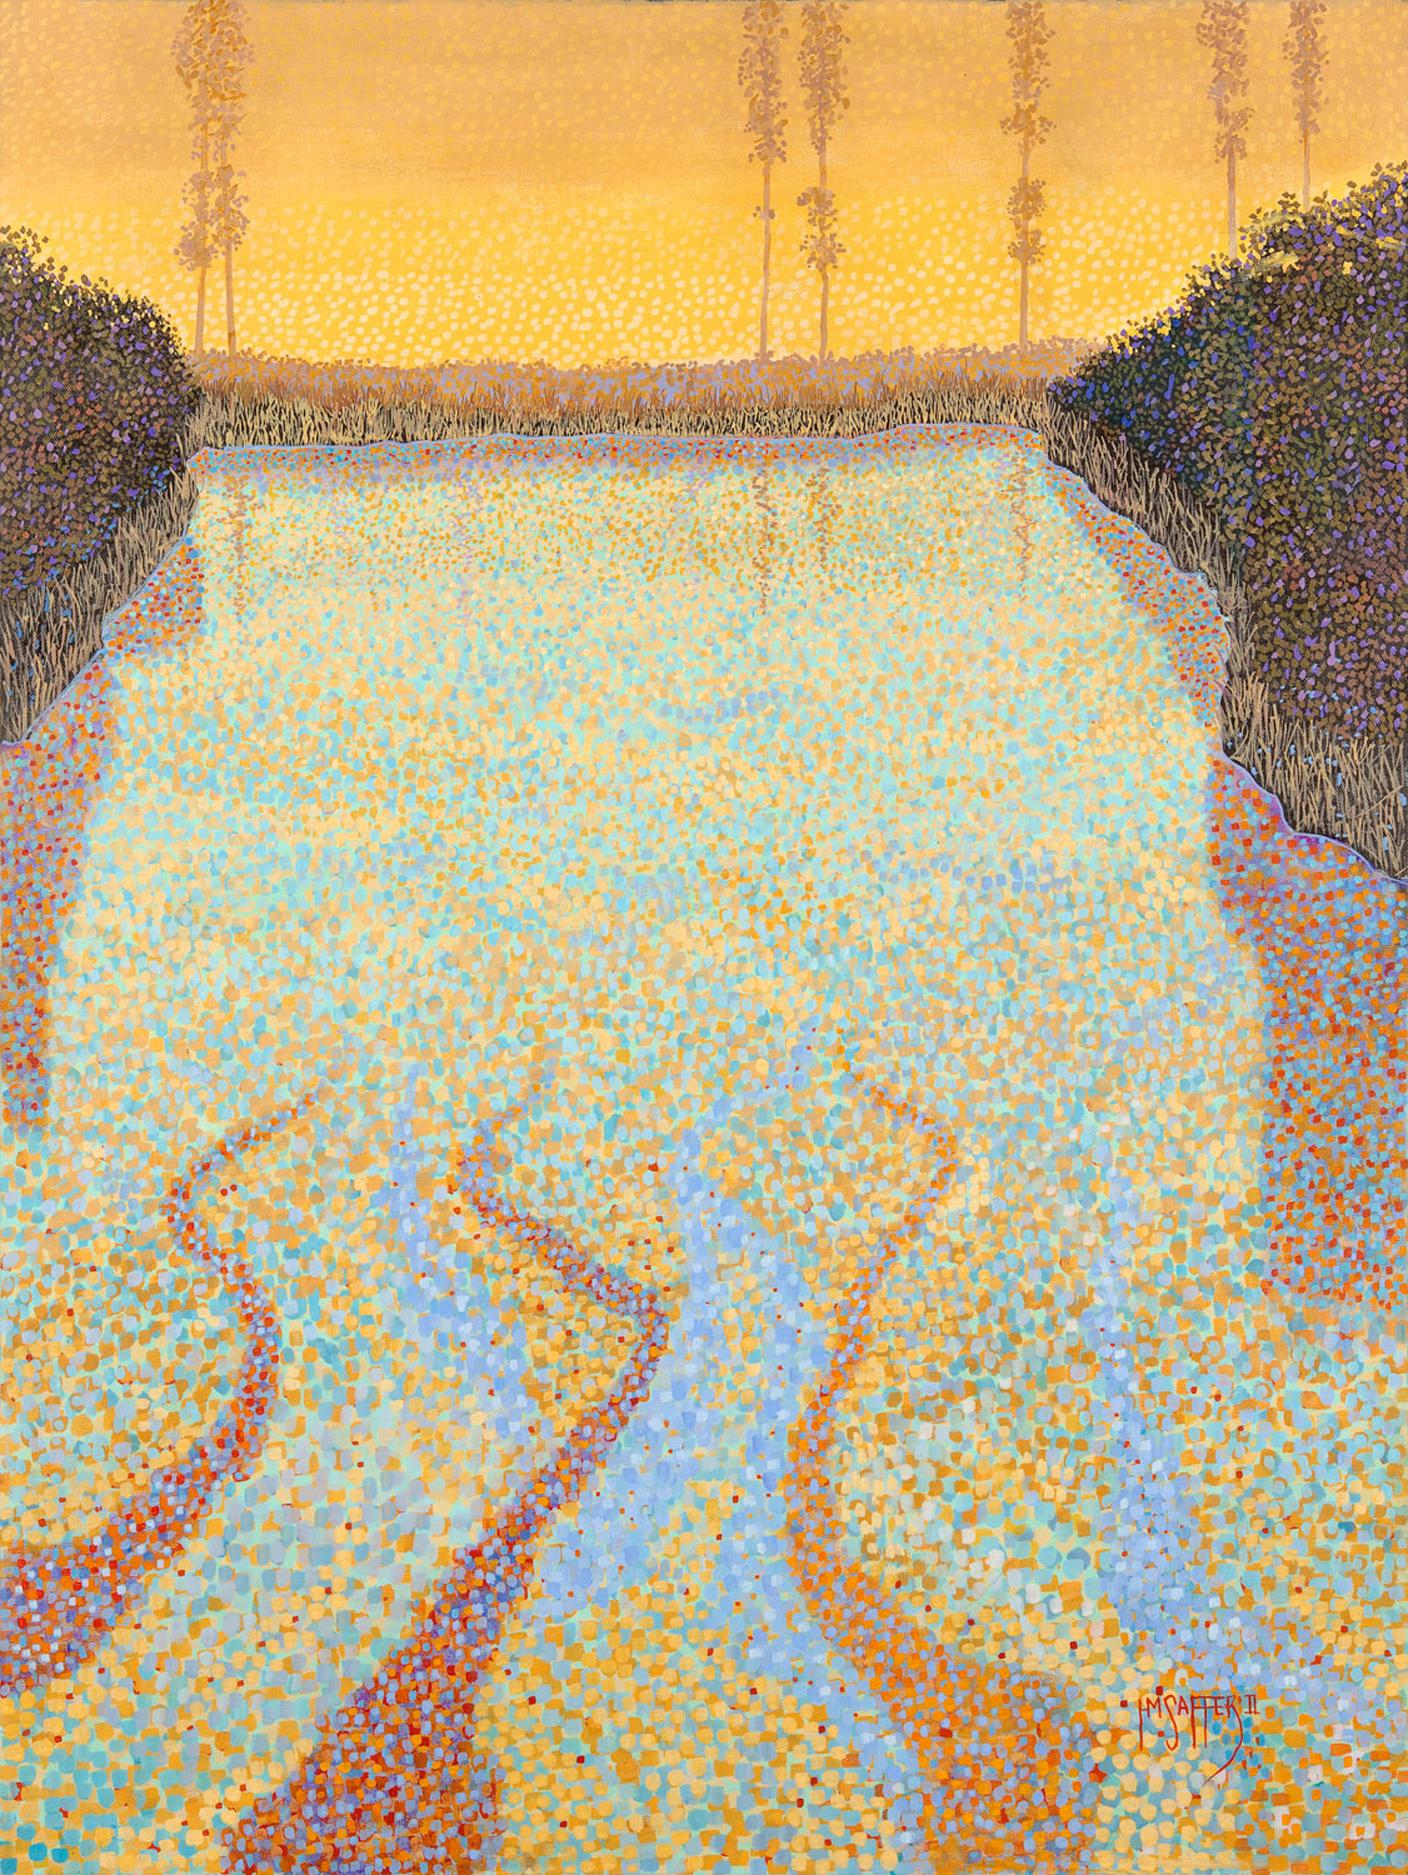 "H.M. Saffer II, ""Water Images IV"", Pointillist Landscape Oil Painting on Canvas"